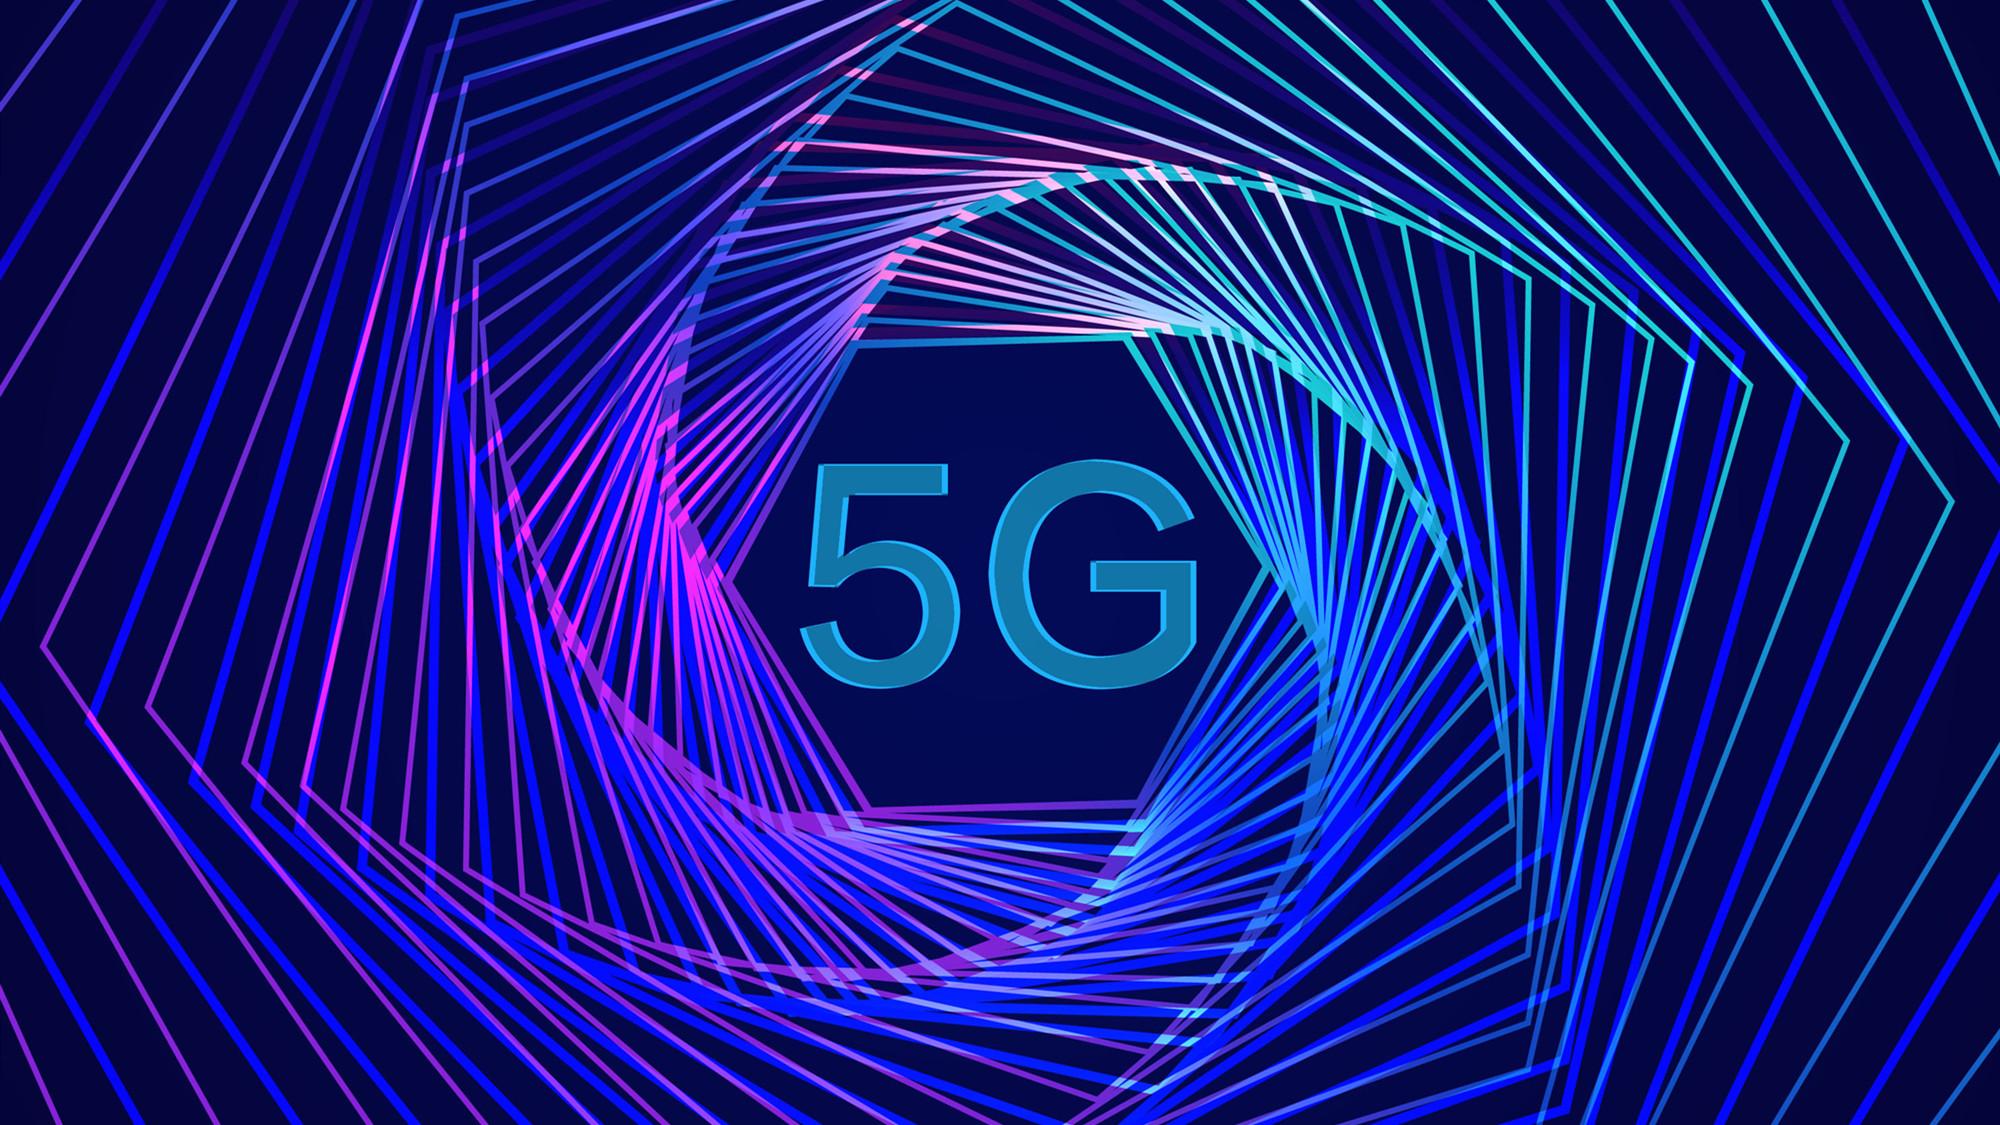 5G进化链迎利好消息电子量化件遇新时代